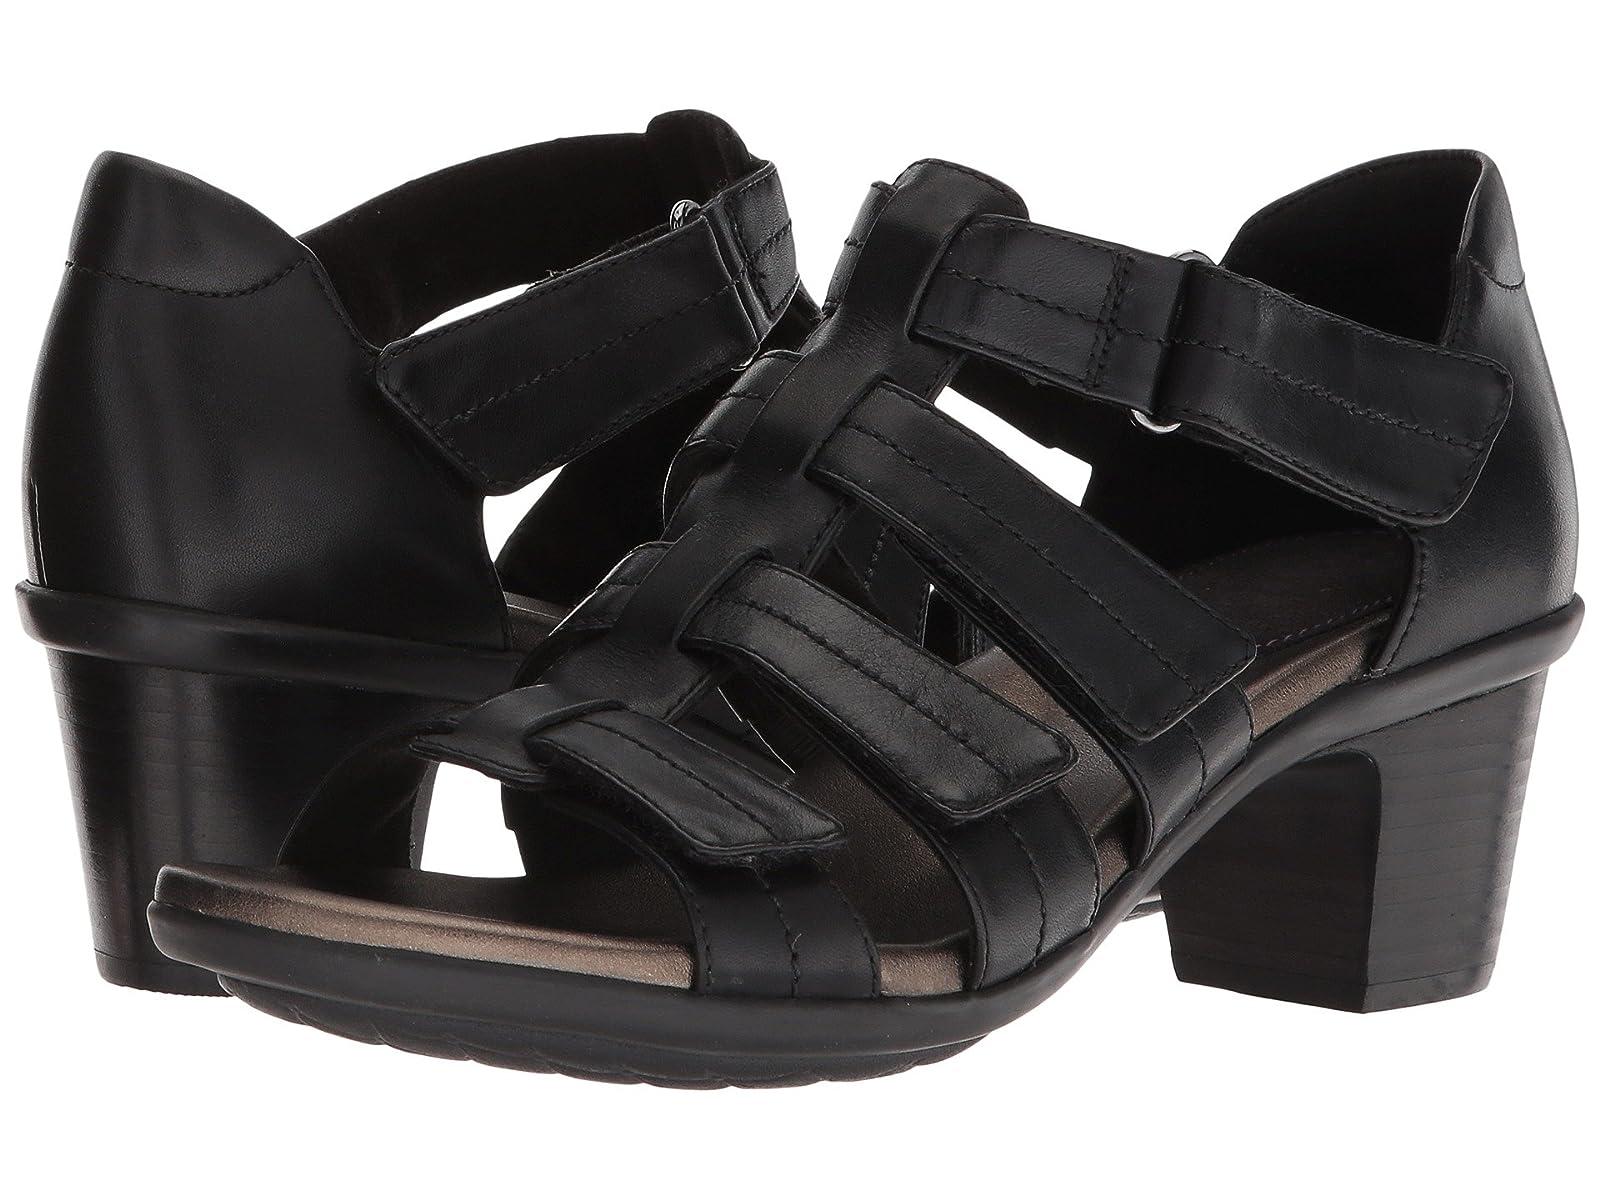 Aravon Medici II GladiatorAtmospheric grades have affordable shoes